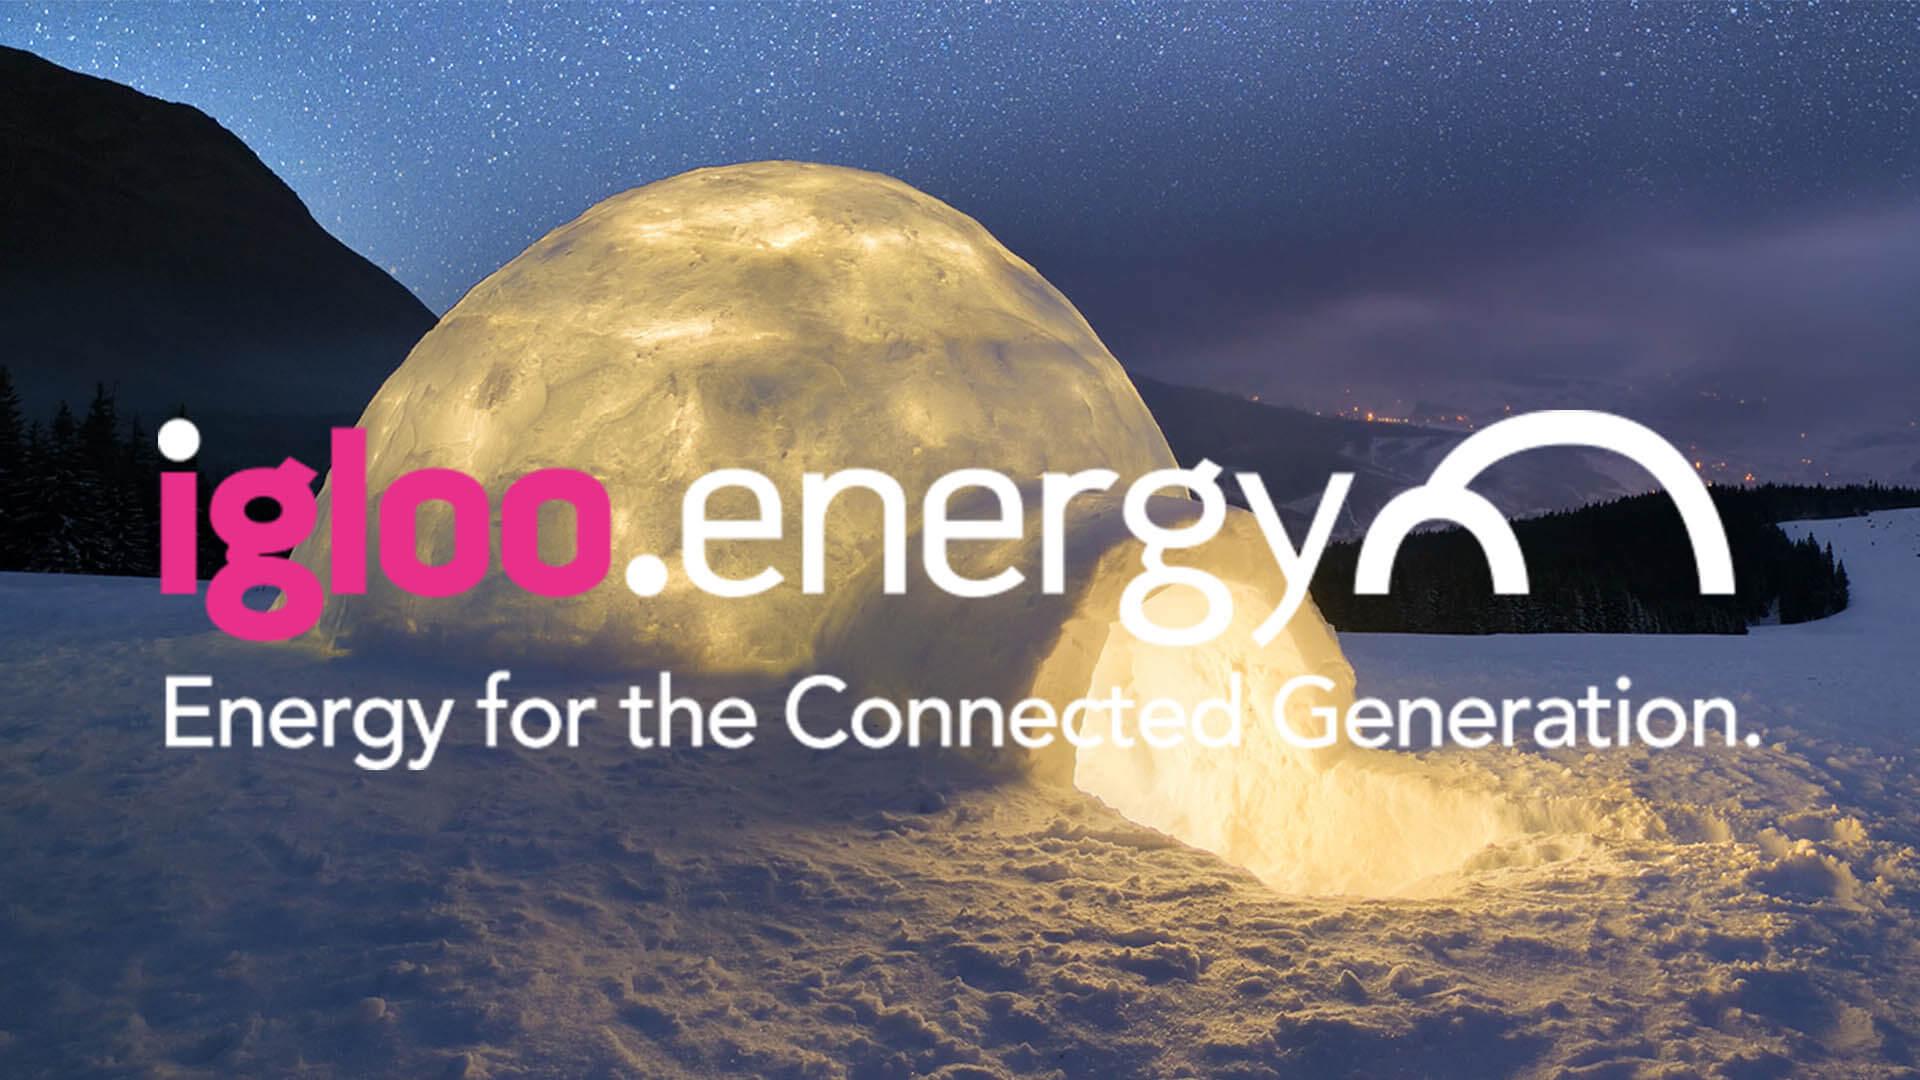 refer.igloo.energy